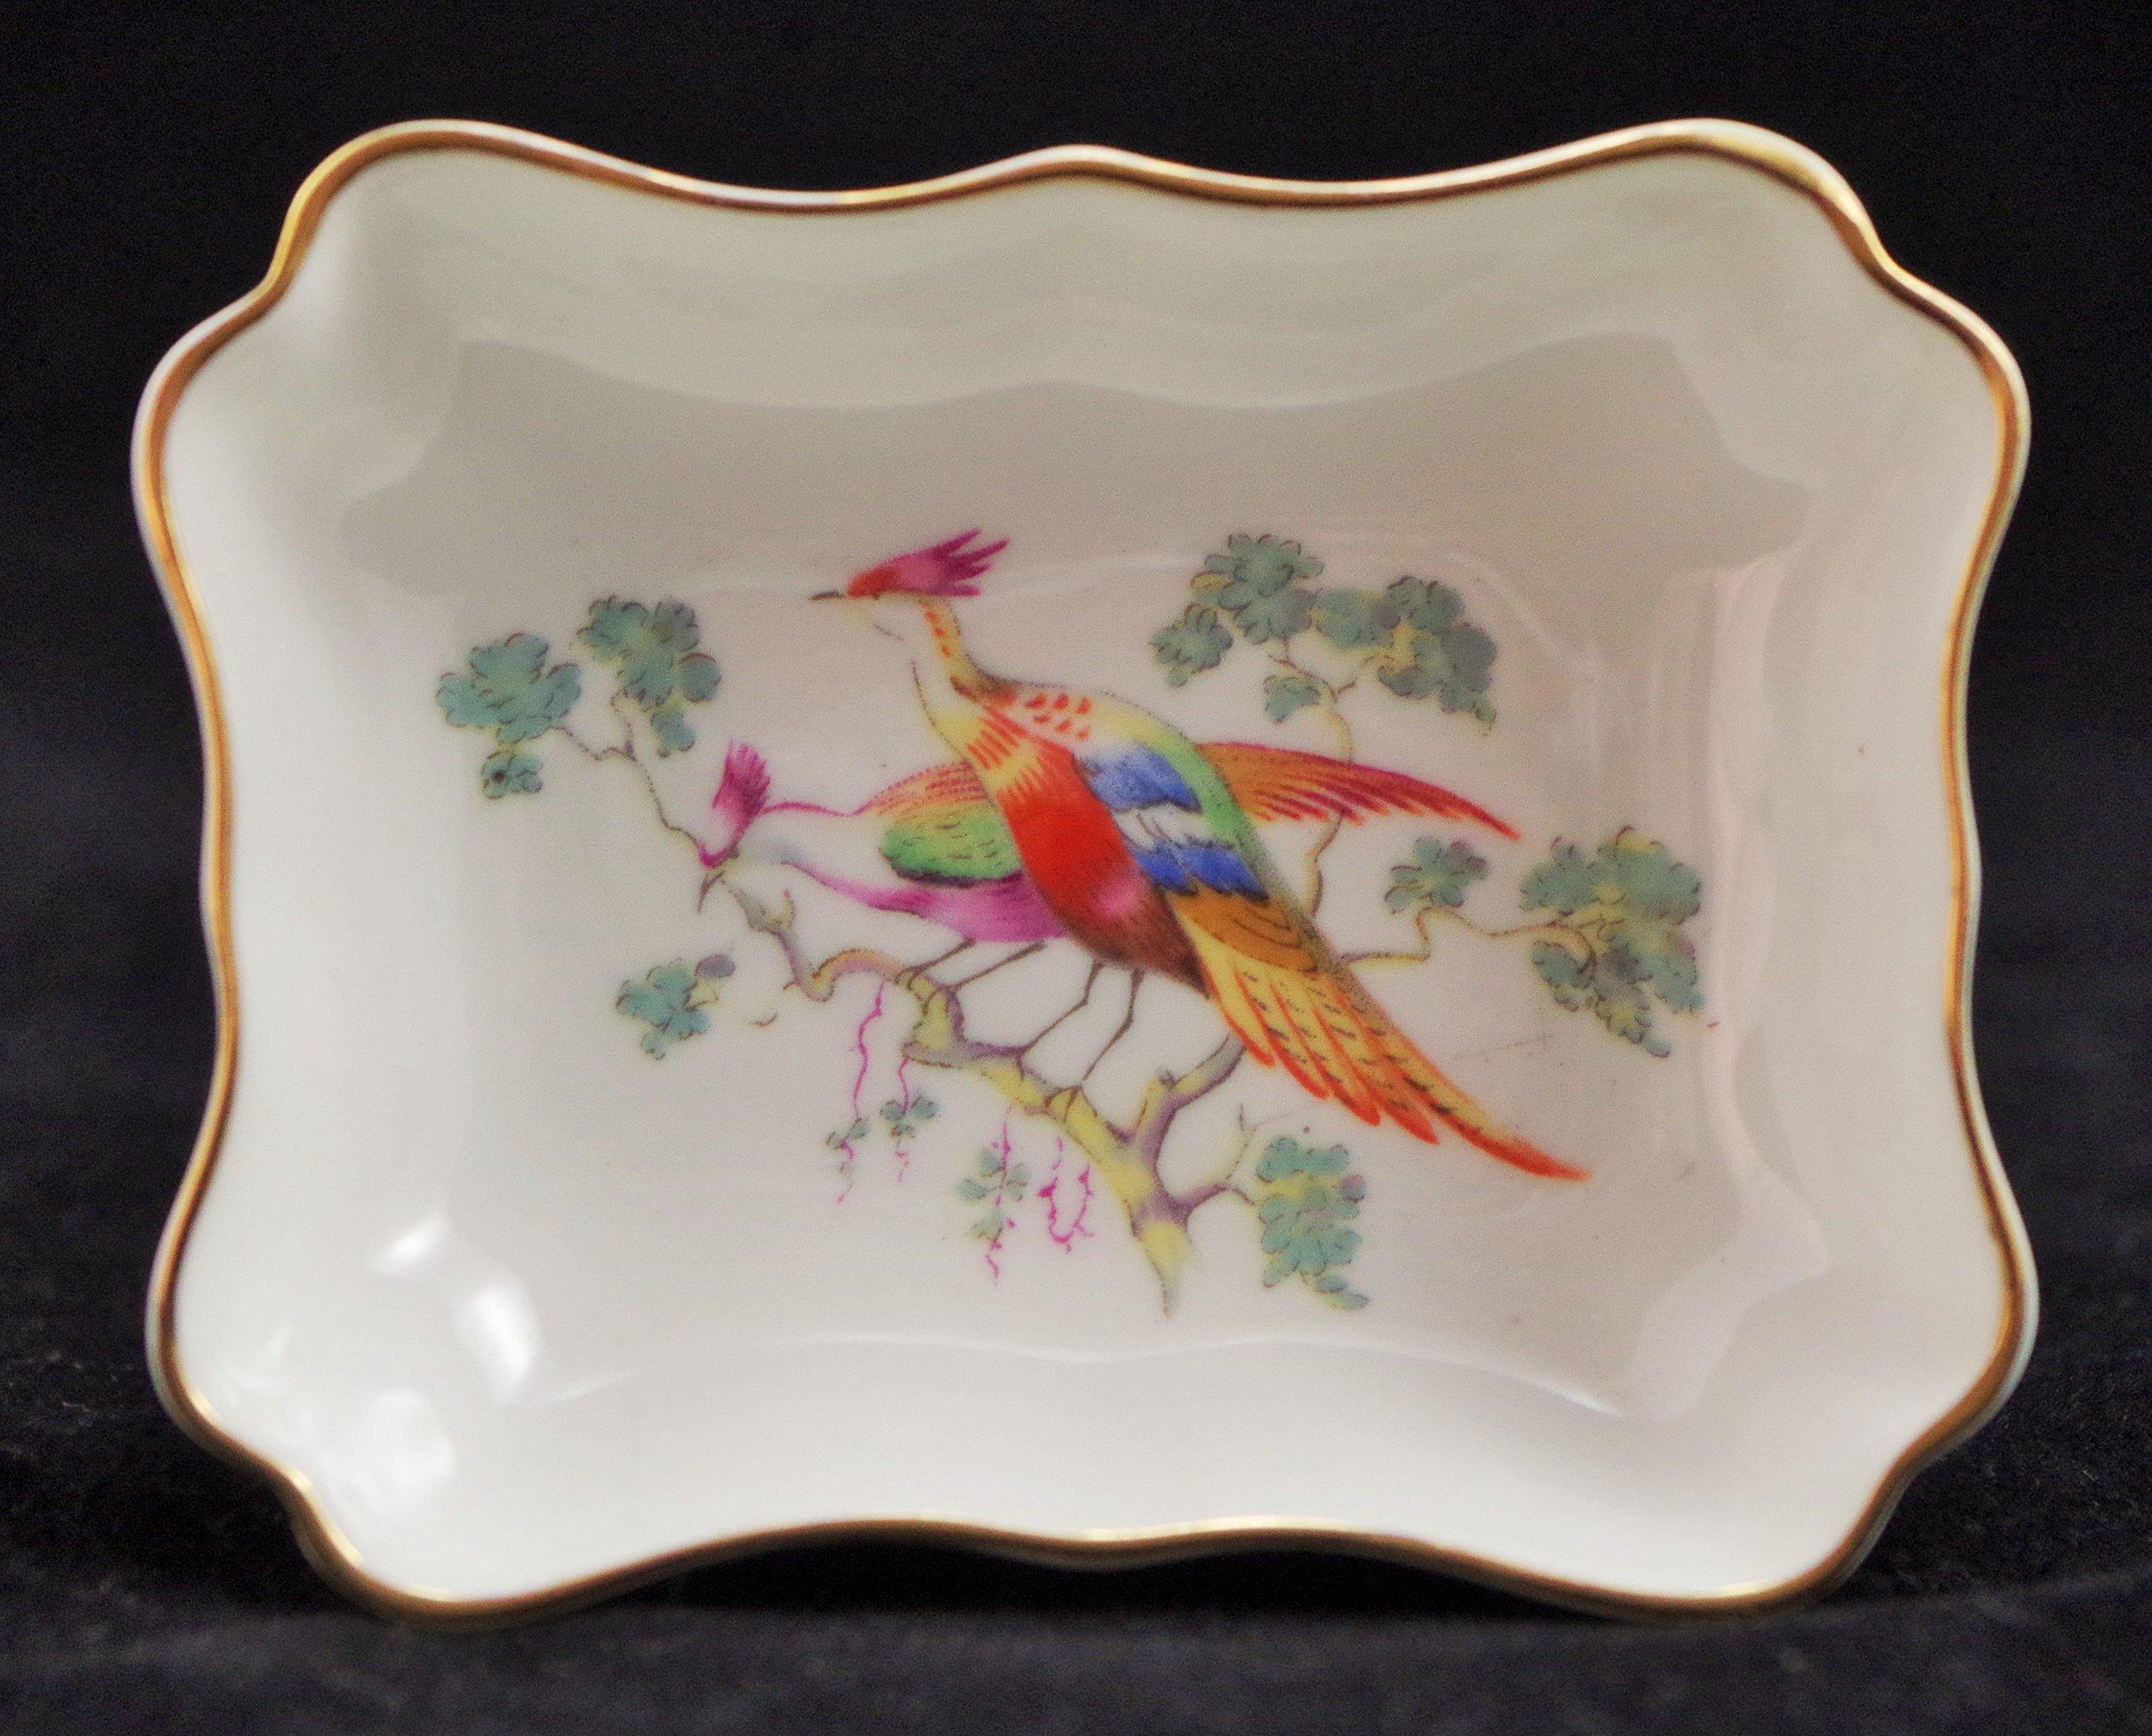 royal-crown-derby-tray-1800-paradise-bird-A420